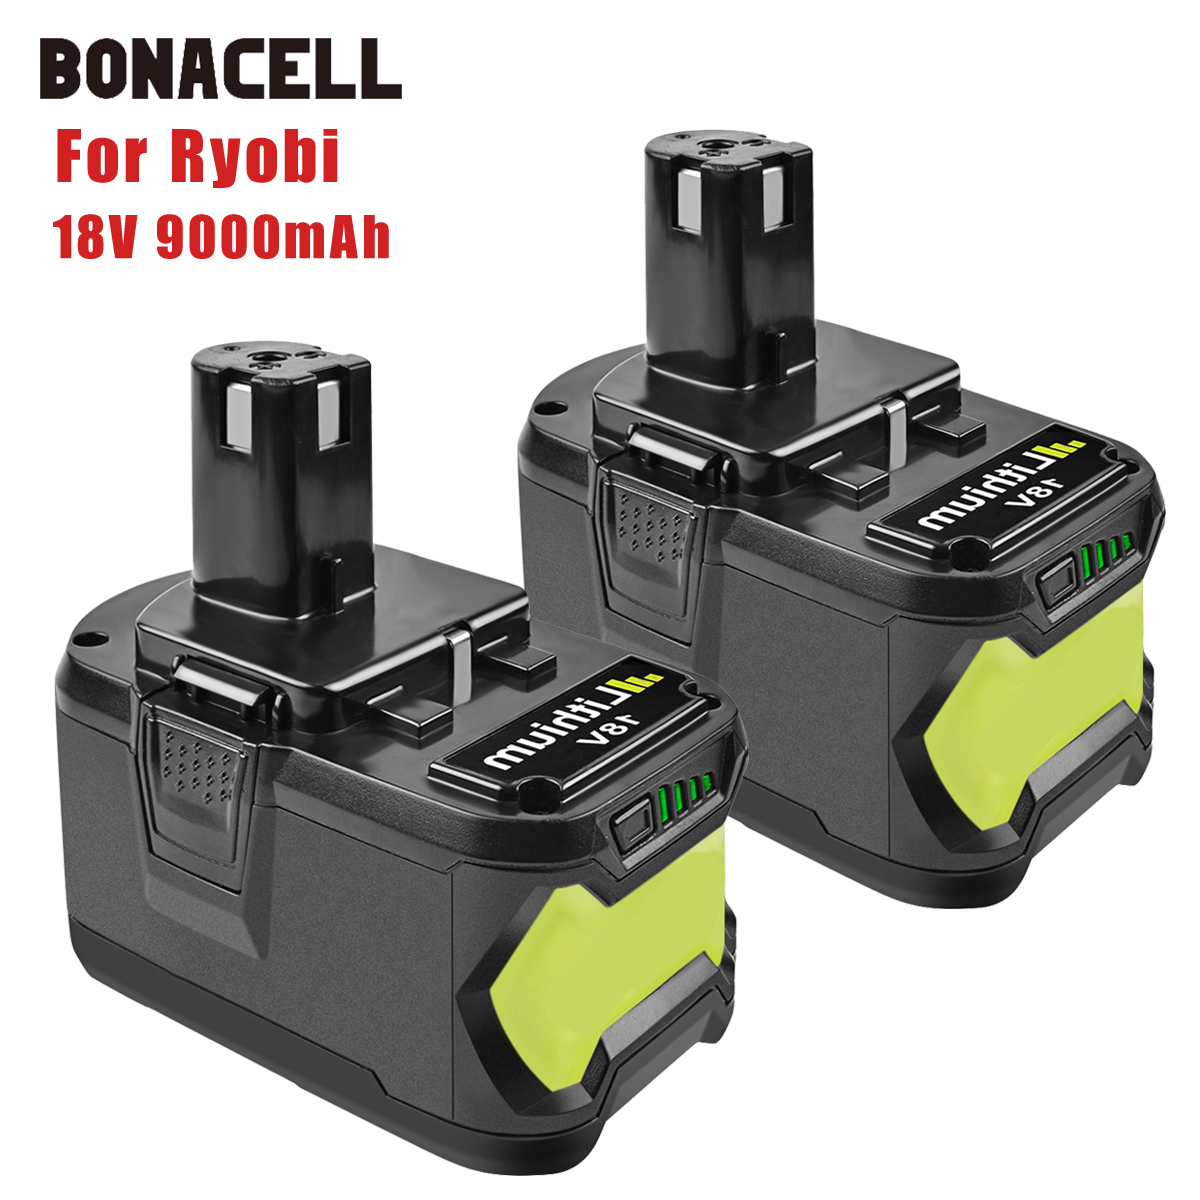 Bonacell 18V 9000mAh Li-Ion P 108 P108 Rechargeable Battery For Ryobi Battery RB18L40 P2000 P310 For BIW180 L70